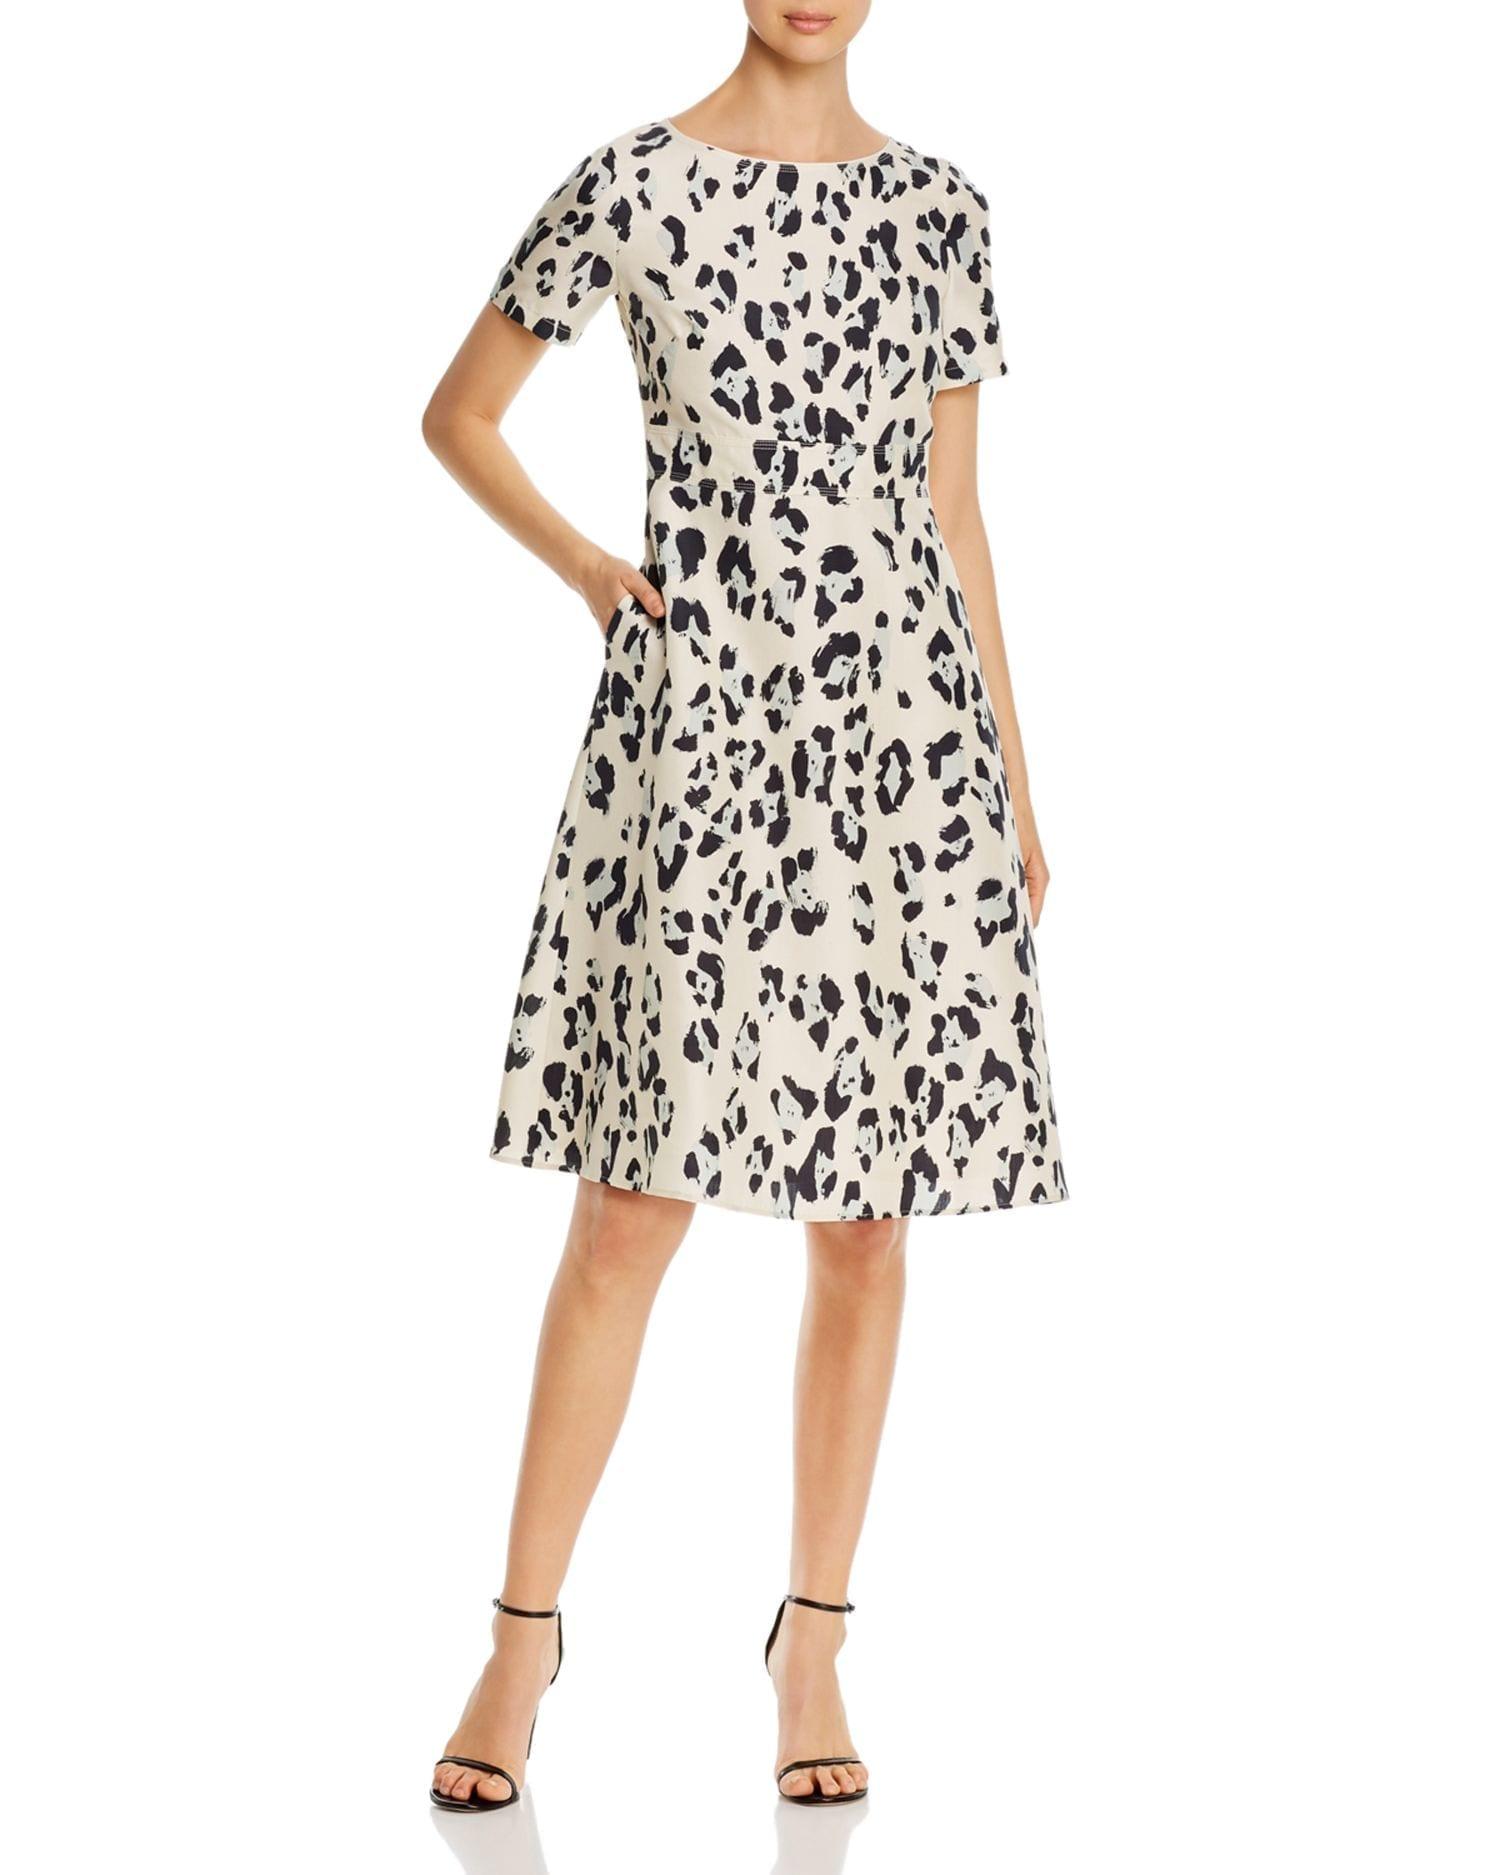 LAFAYETTE 148 NEW YORK Amanda Printed Dress